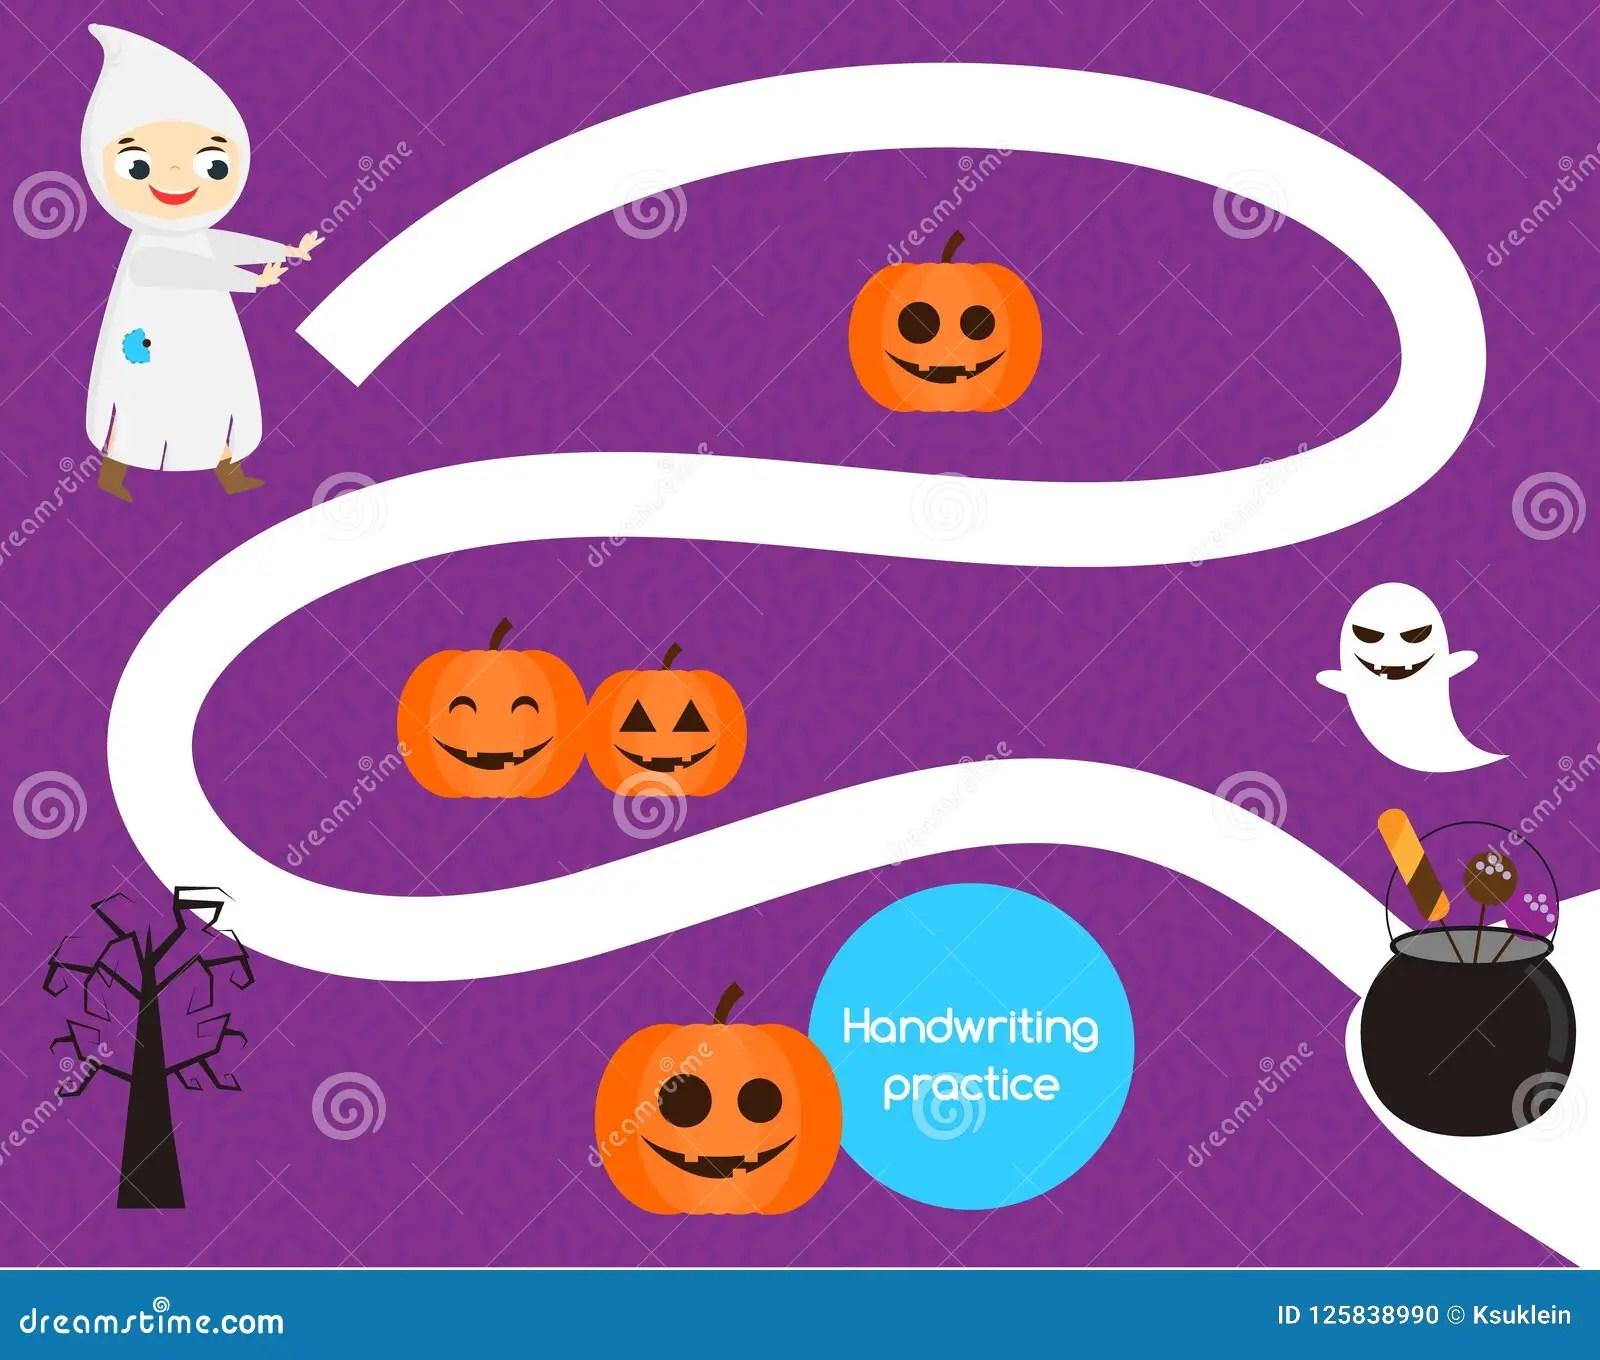 Halloween Handwriting Practice Sheet Educational Children